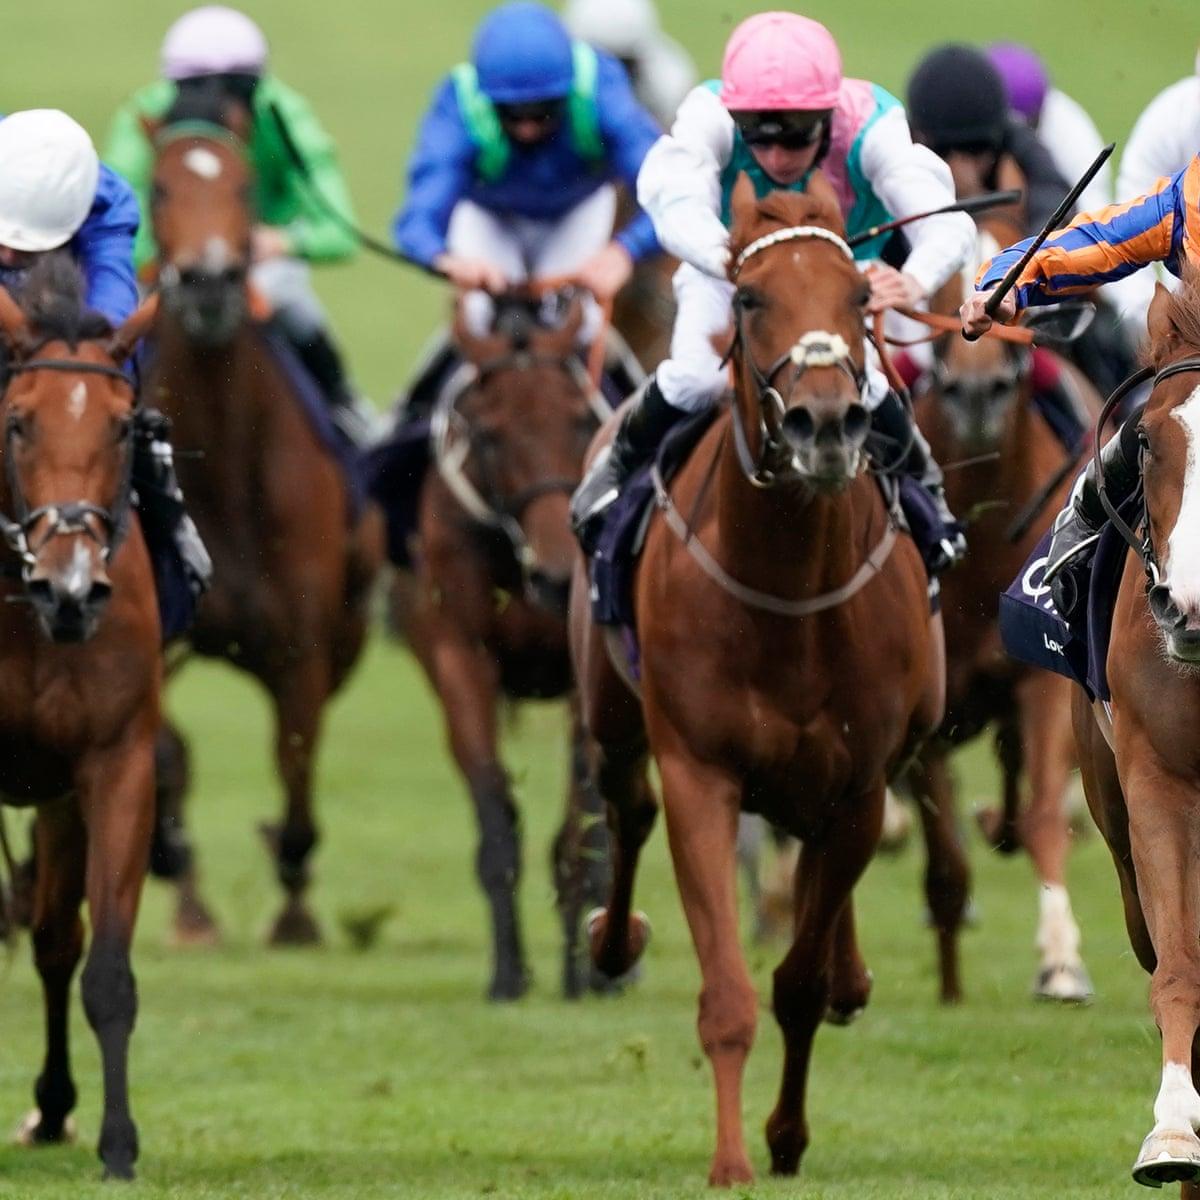 Irish 1000 guineas betting 2021 movies profitable cryptocurrency 2021 nfl